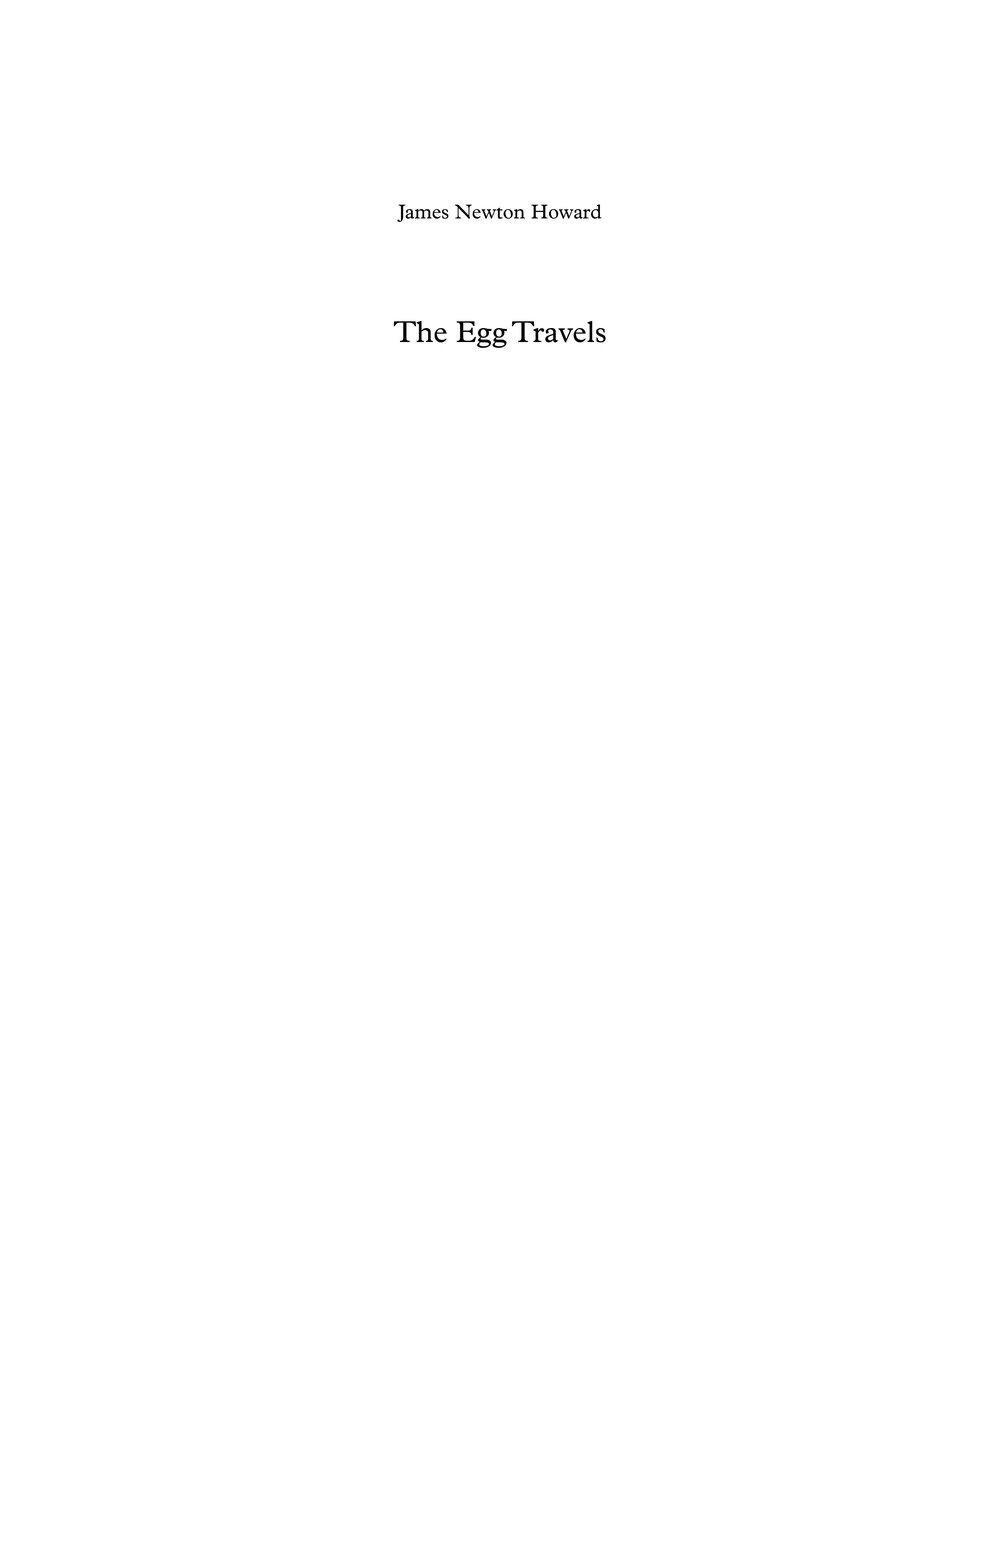 The Egg Travels - Full Score-page-001.jpg